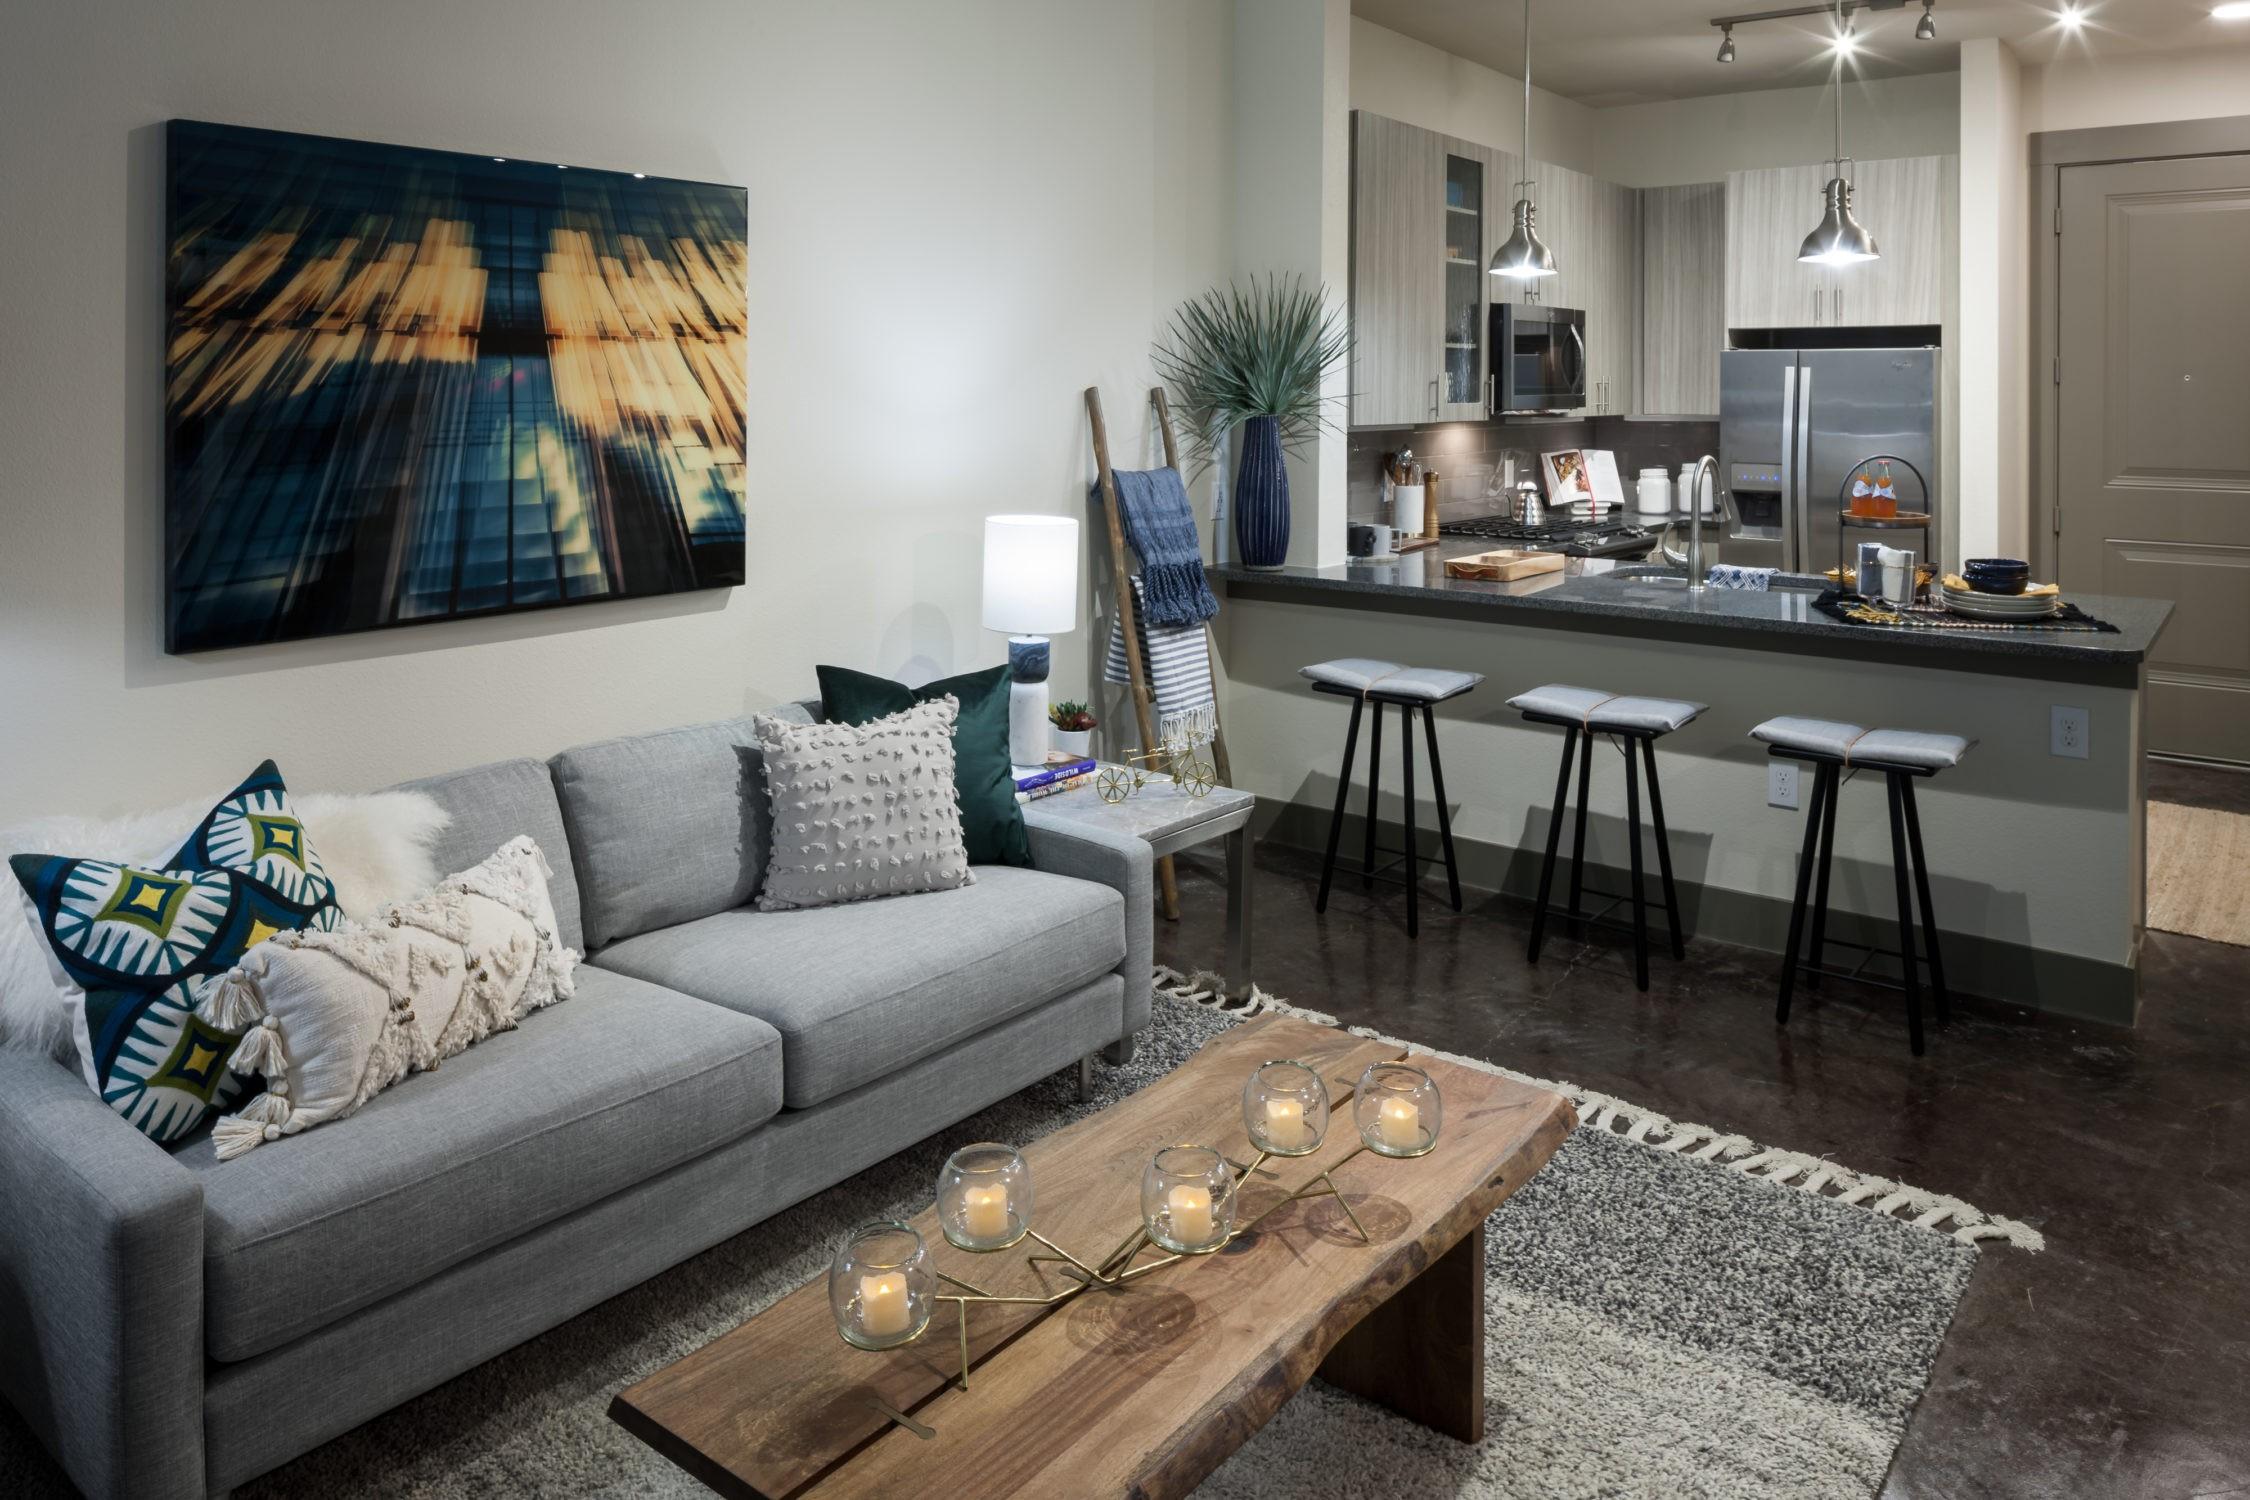 Rooms For Rent Carrollton Tx